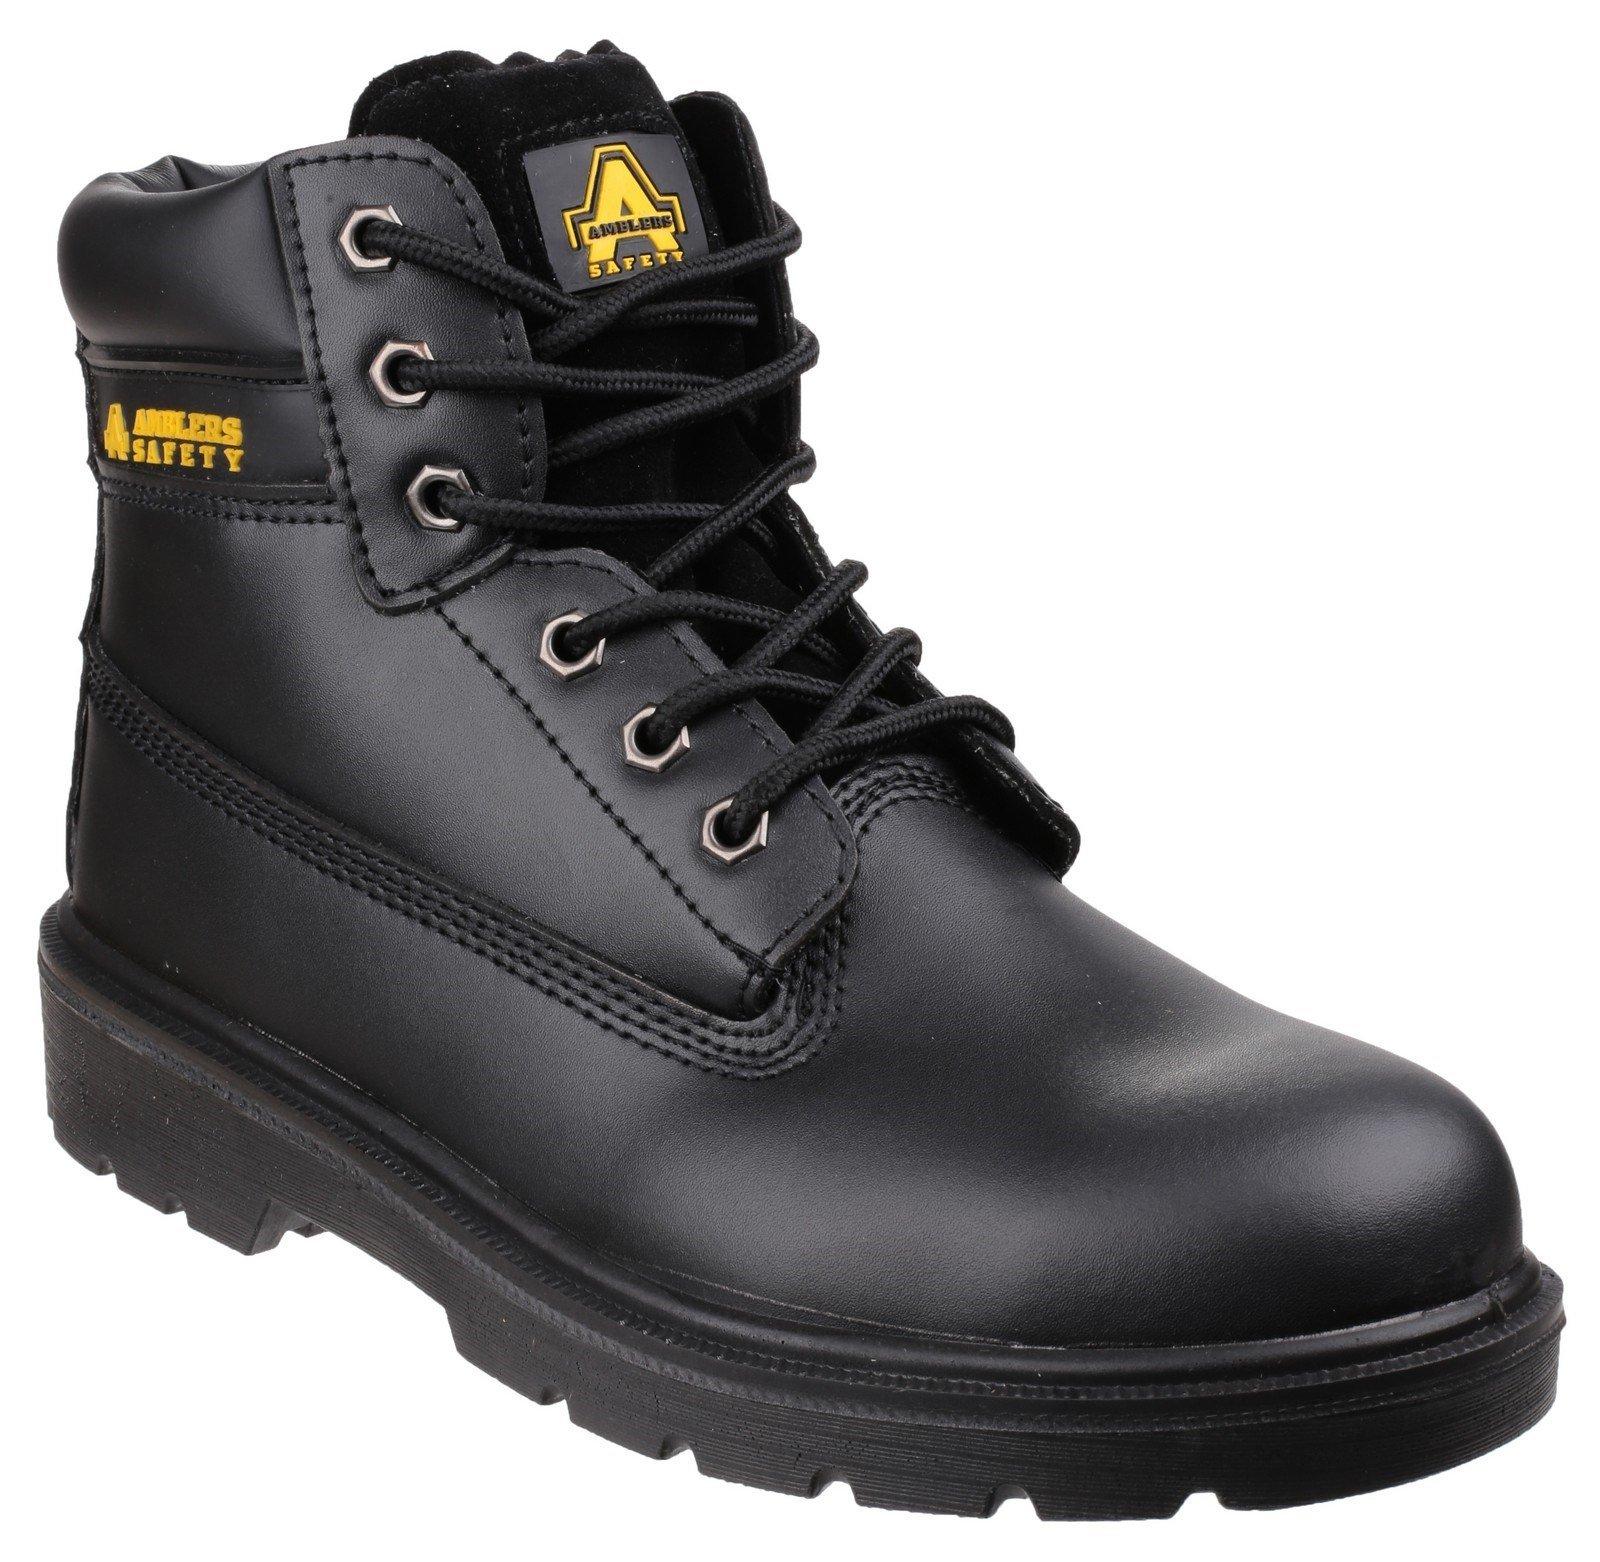 Amblers Unisex Safety Boot Black 24867 - Black 3